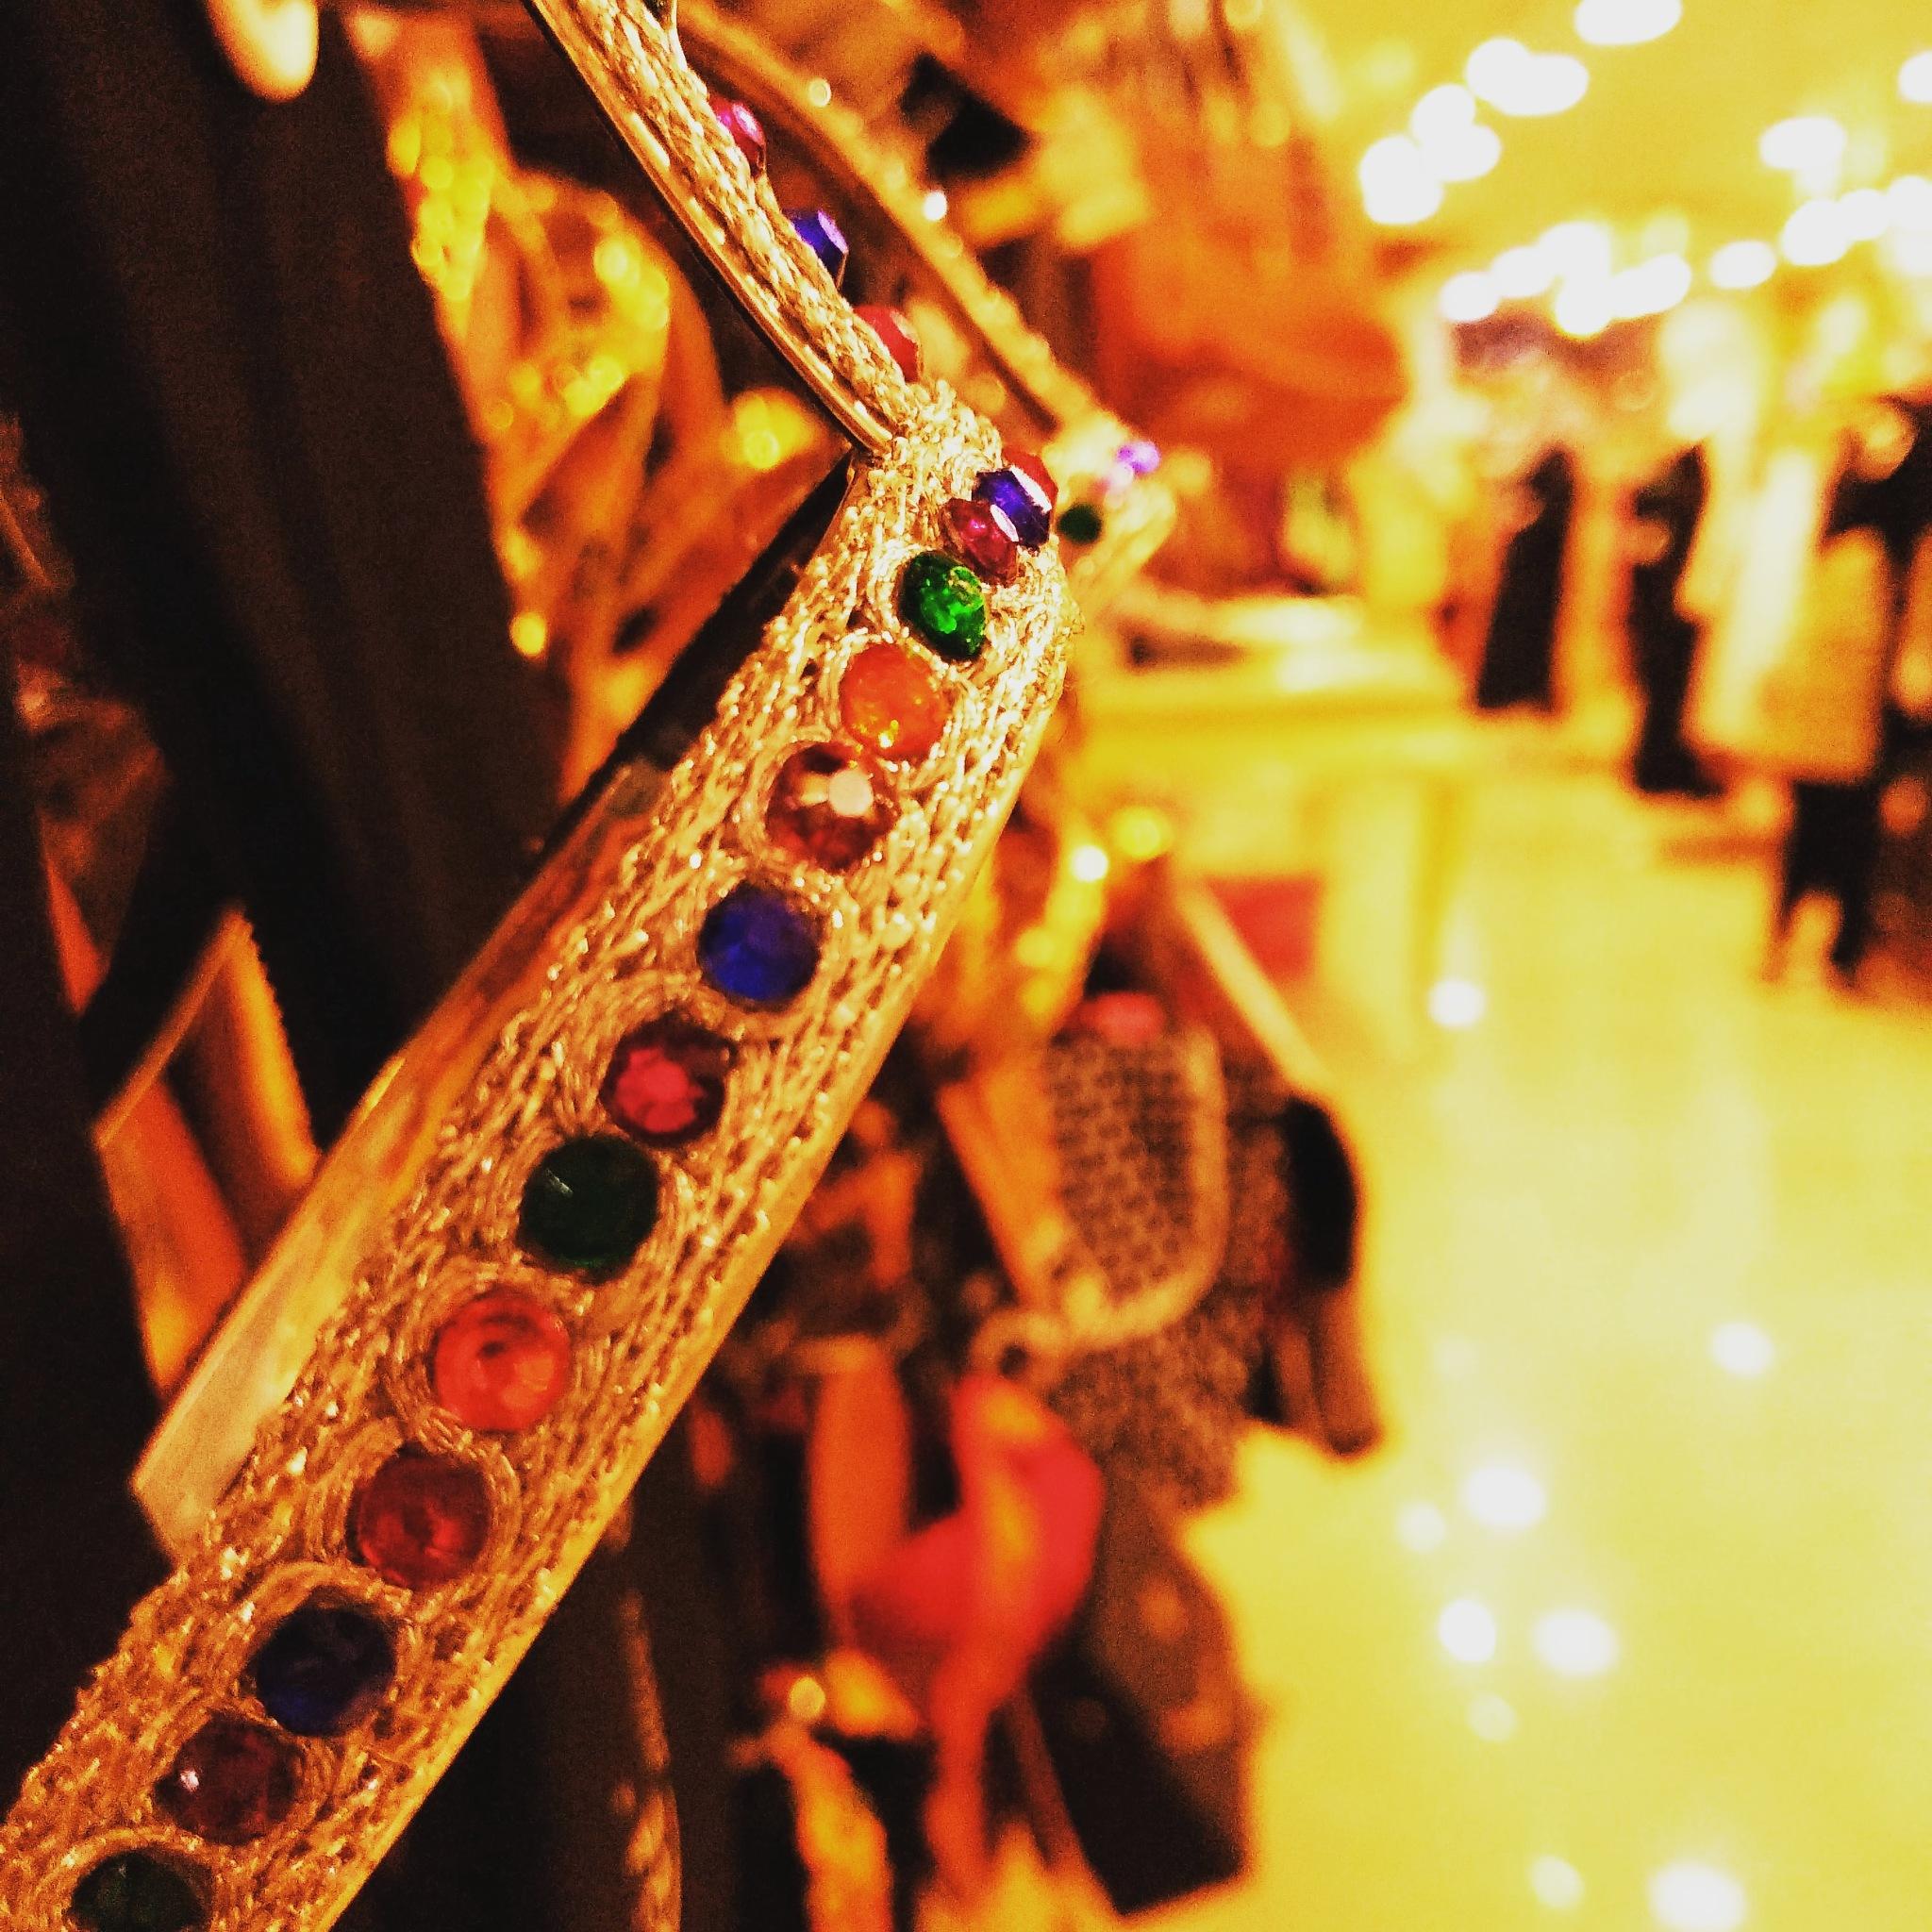 Colors by Muhammad Aqib Javed